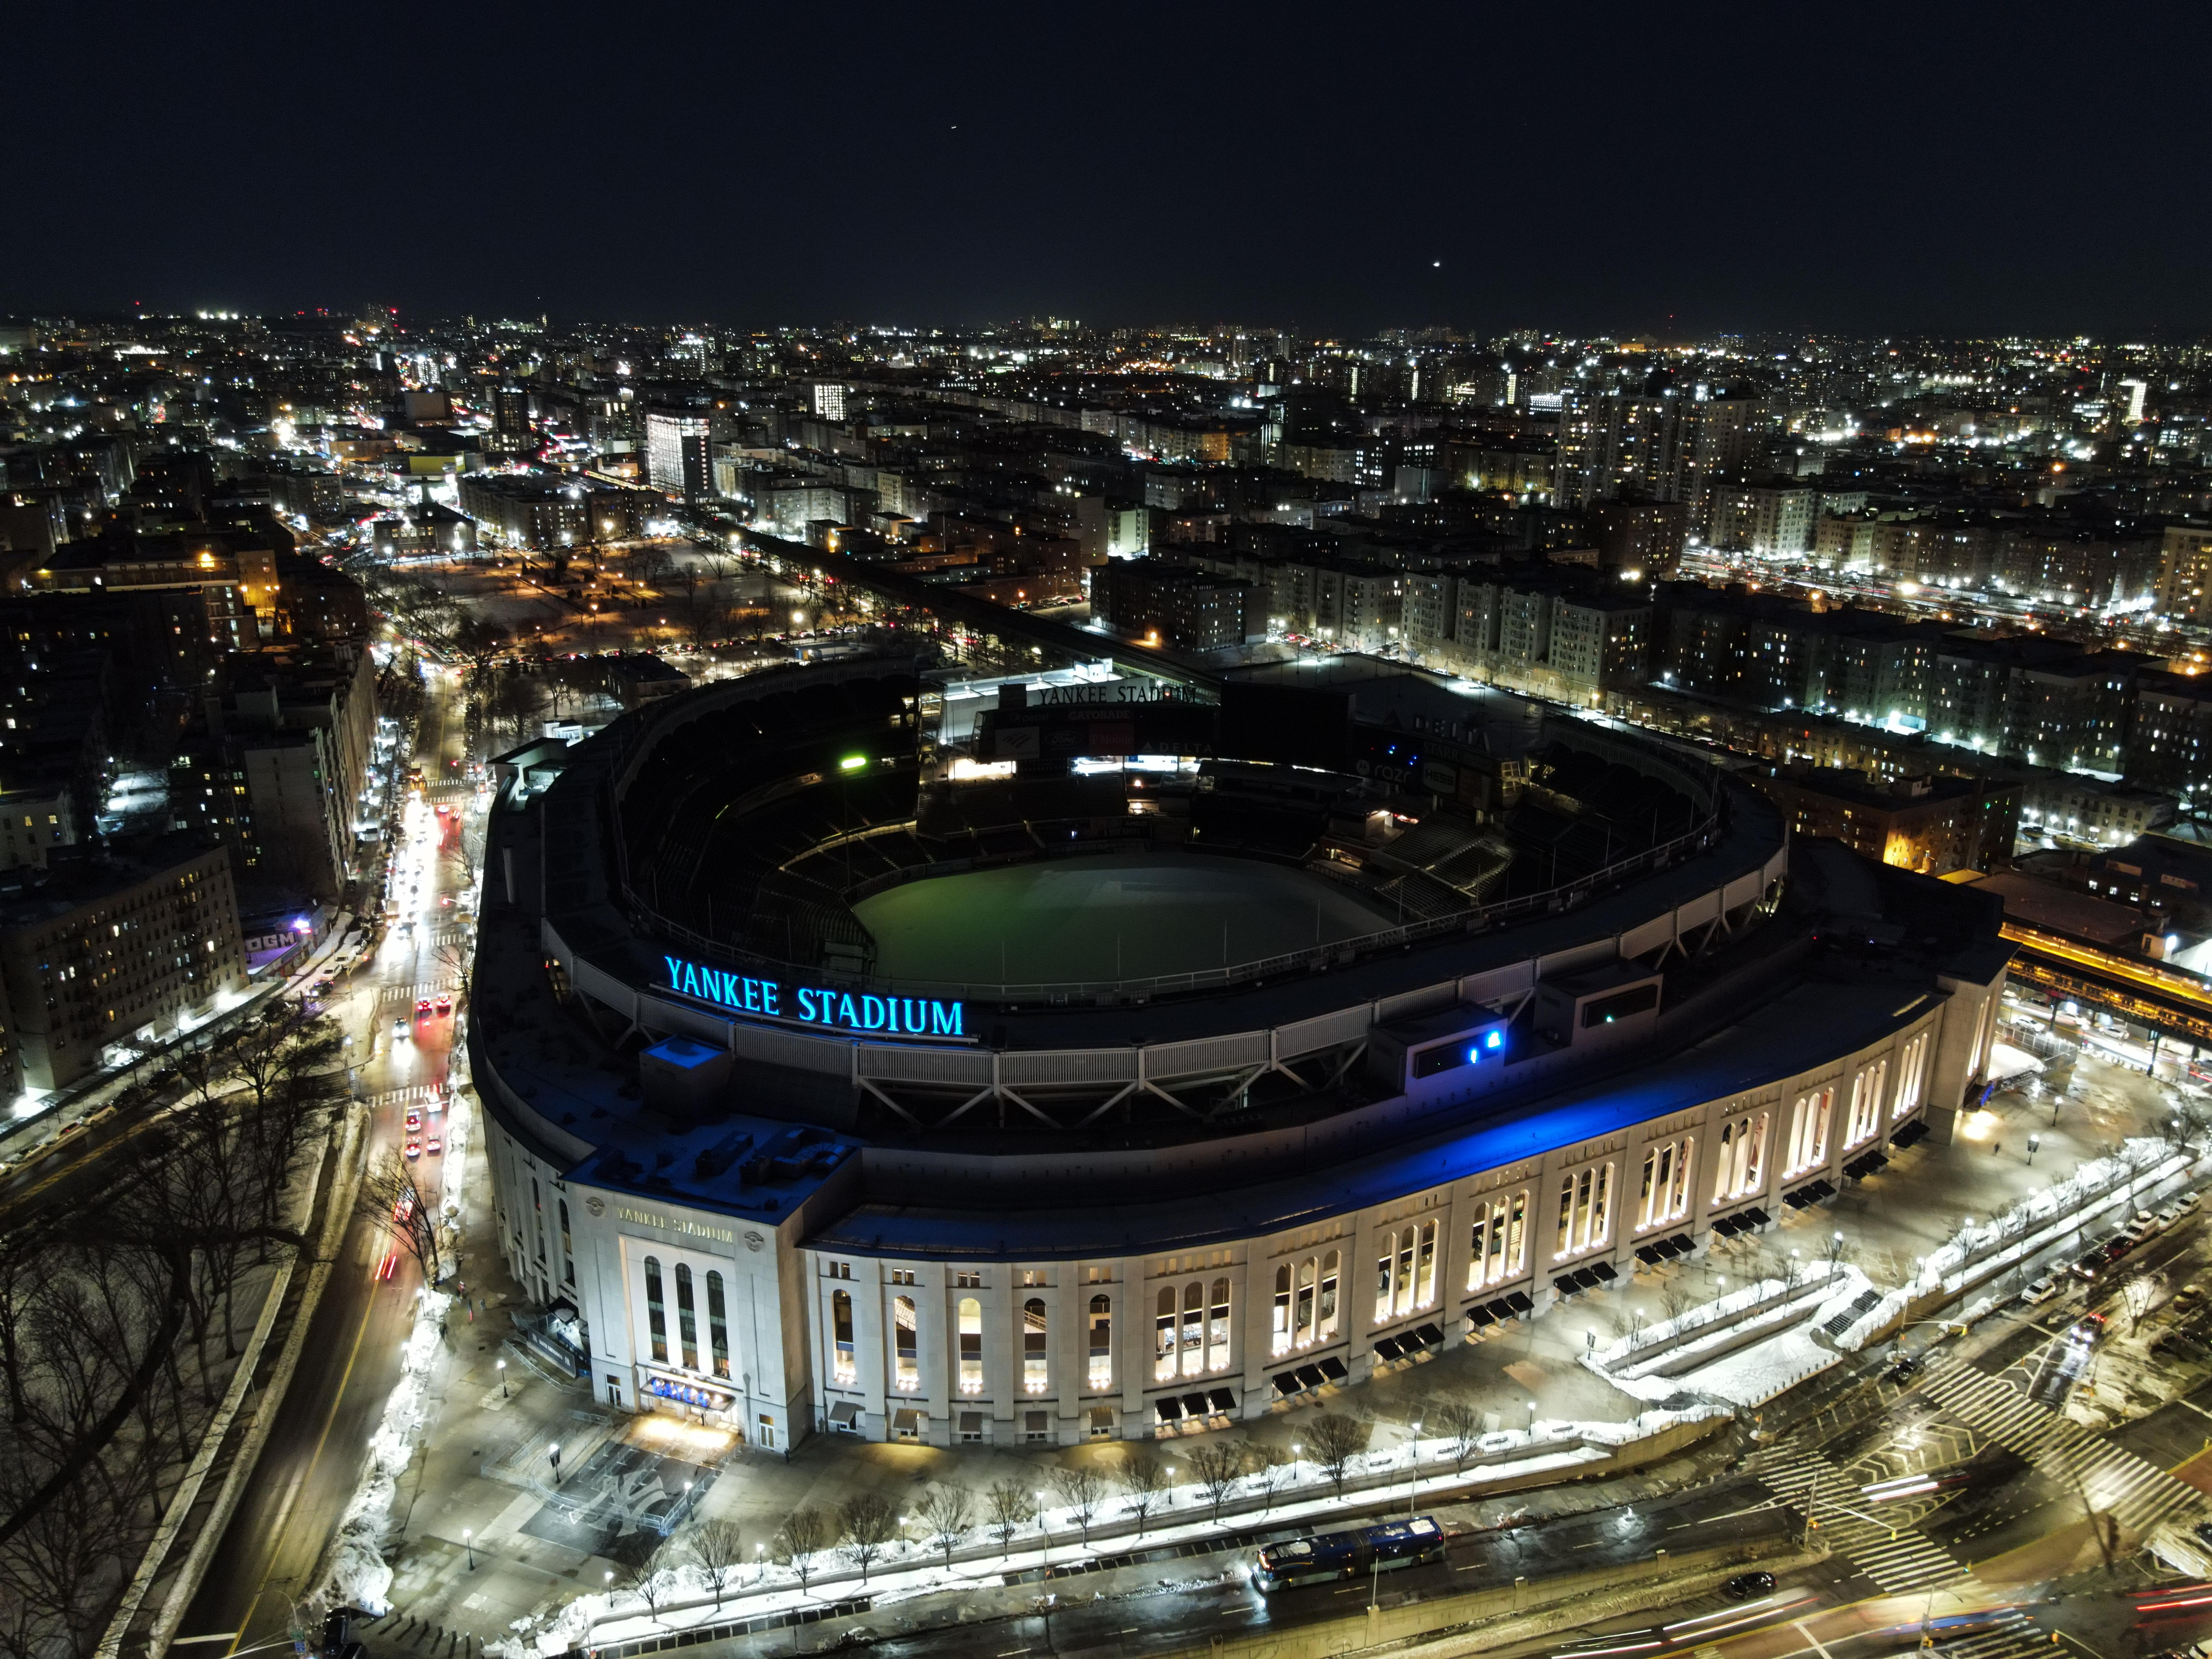 Yankee Stadium vaccination site opening in NYC